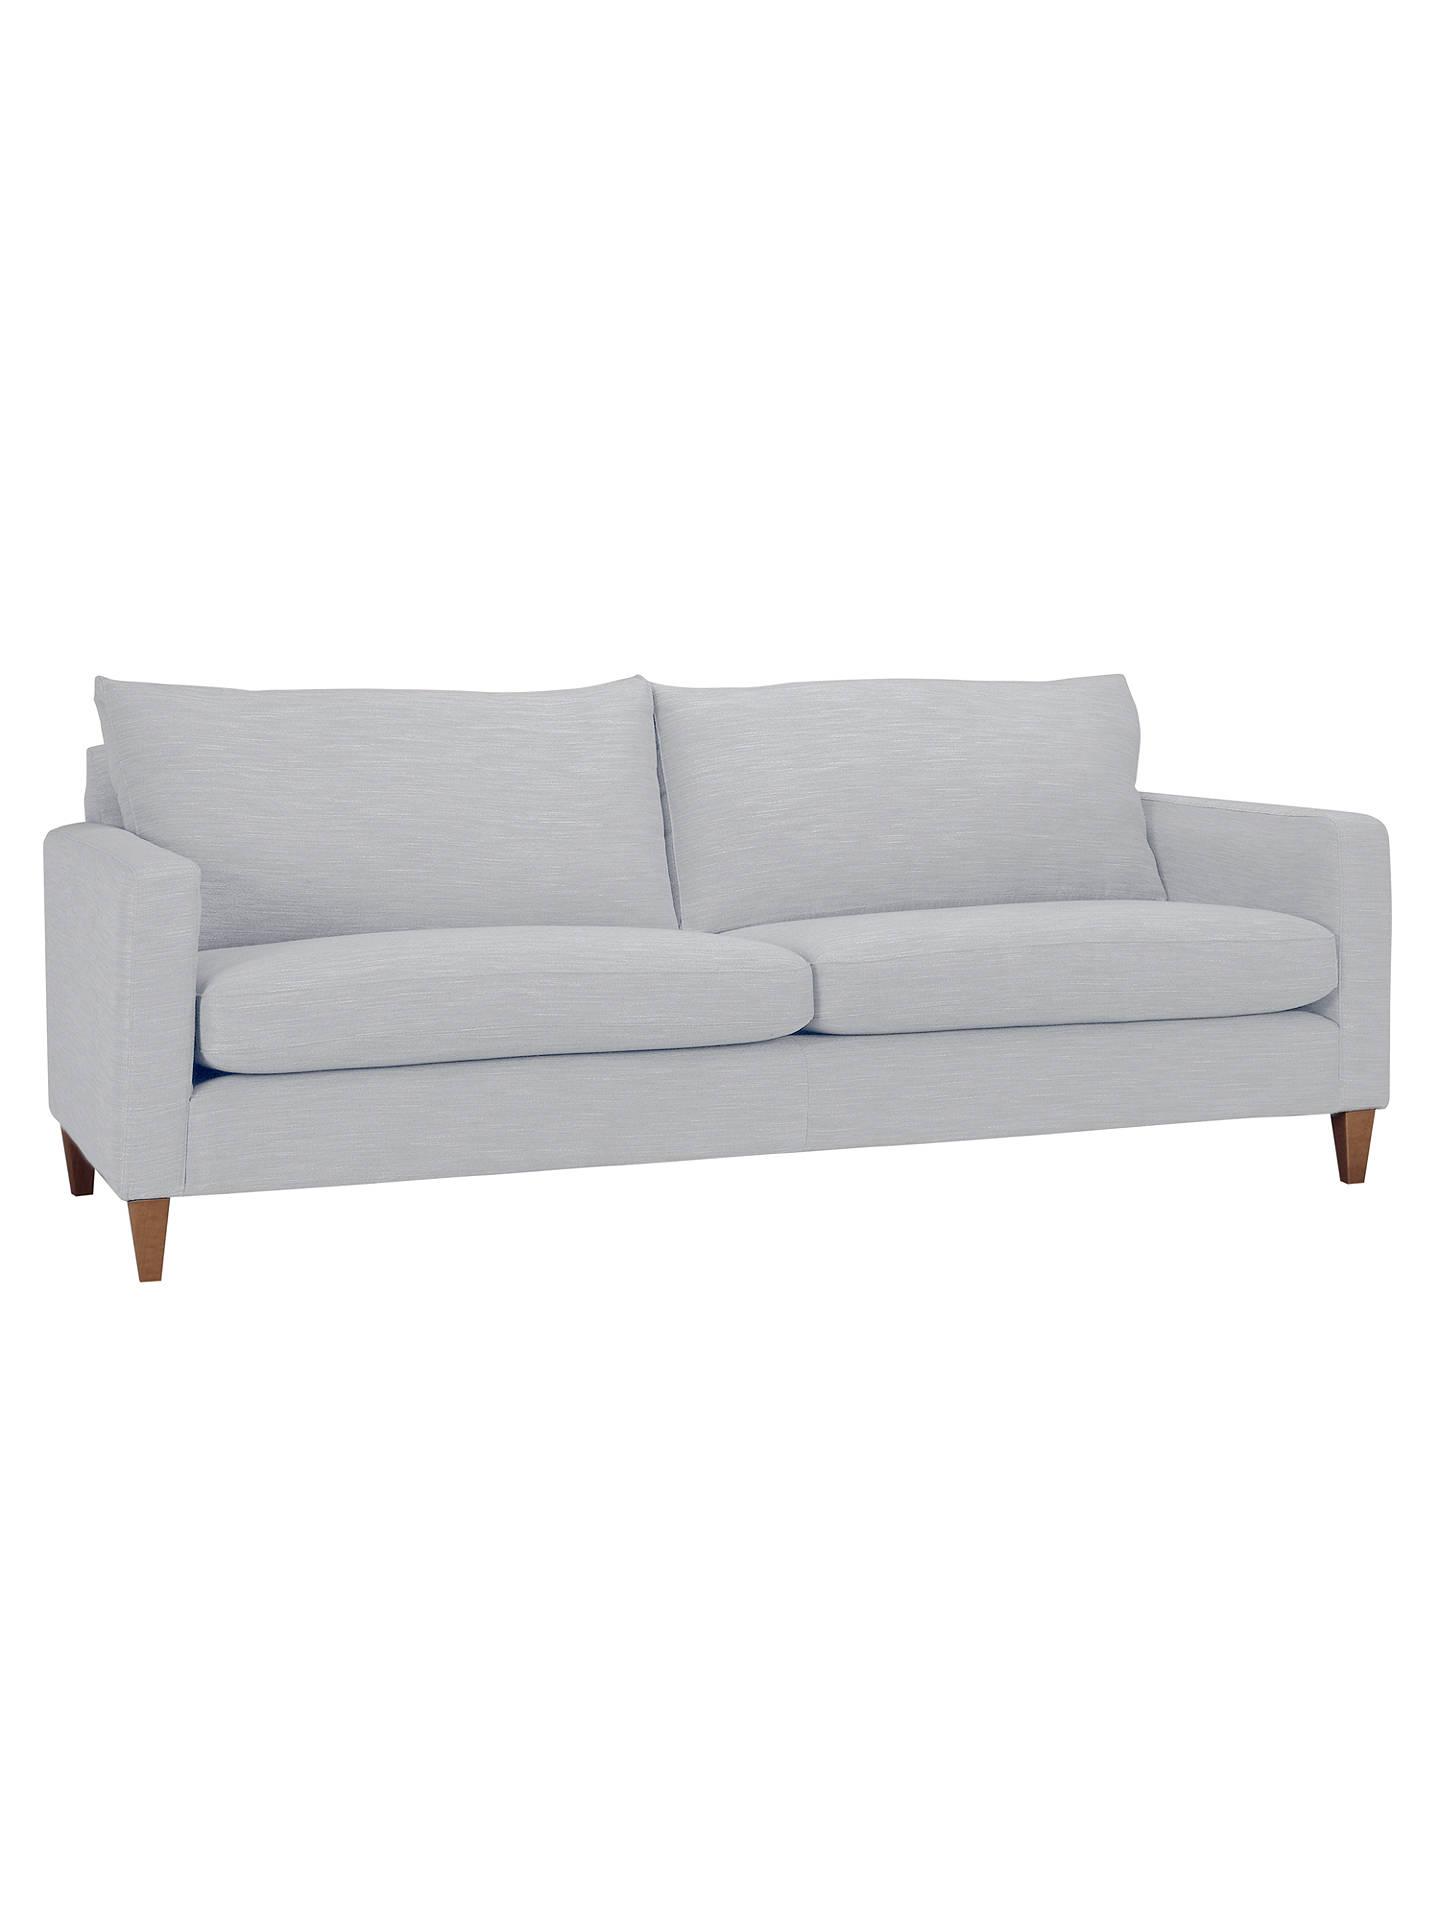 Tremendous John Lewis Partners Bailey Grand 4 Seater Sofa Best Image Libraries Sapebelowcountryjoecom